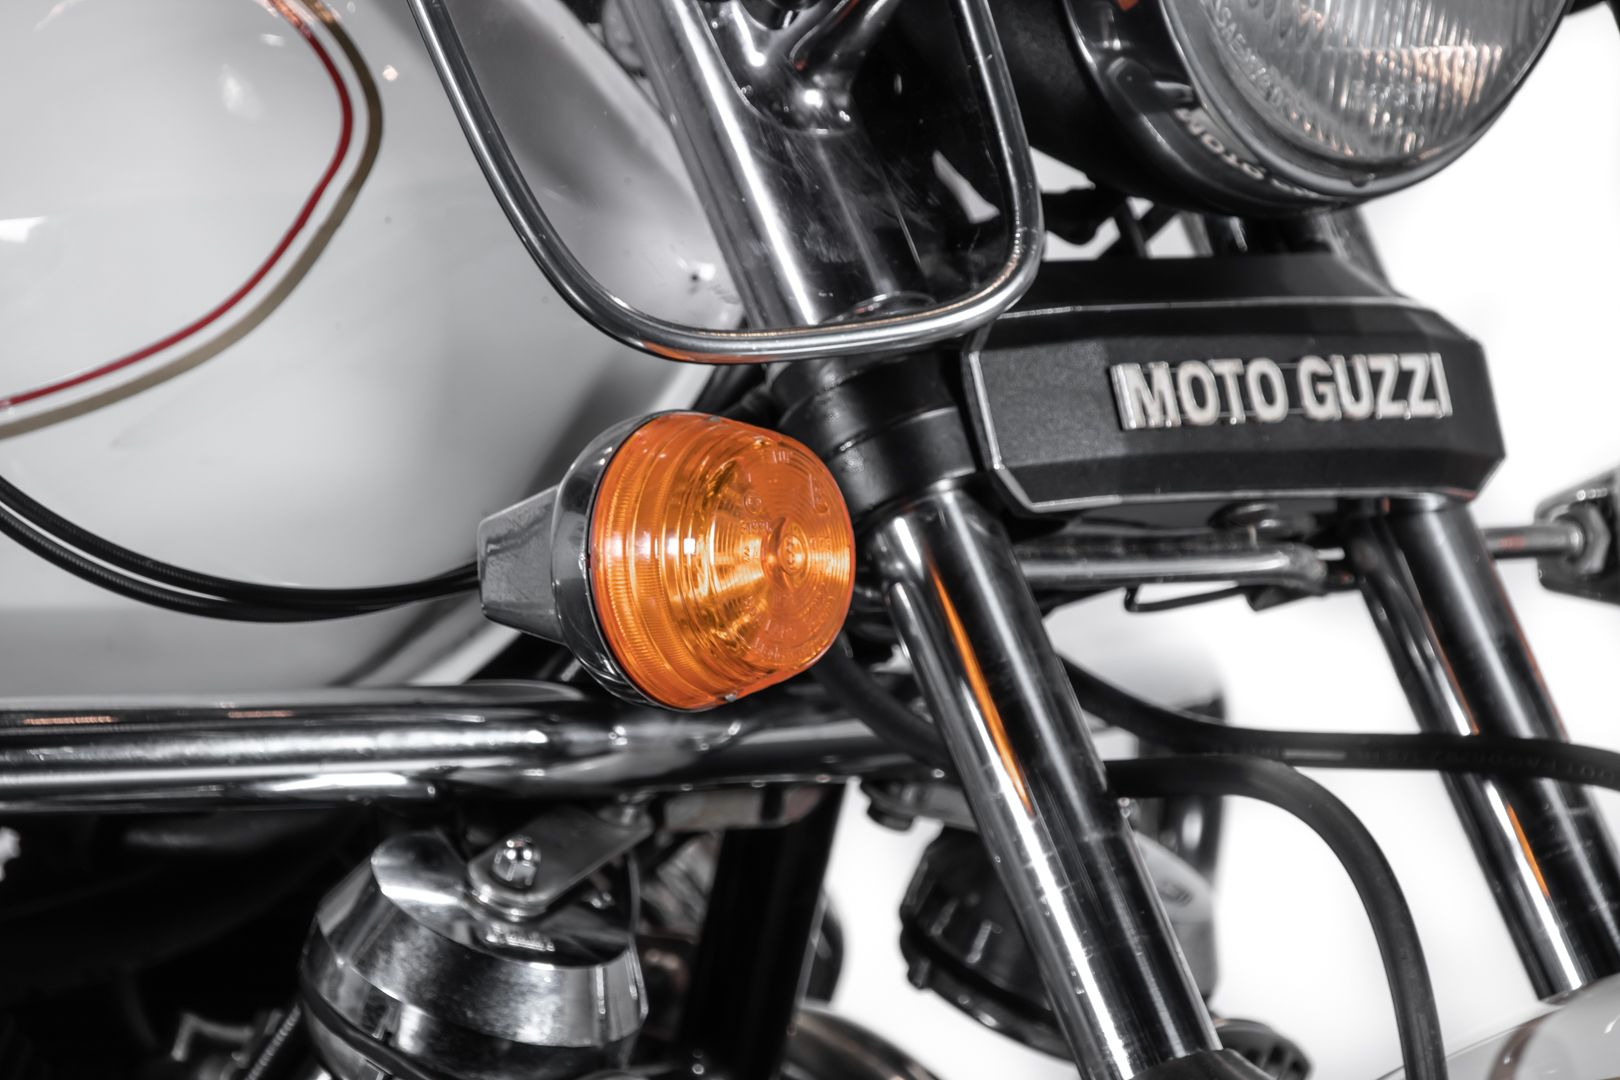 1983 Moto Guzzi California 78924